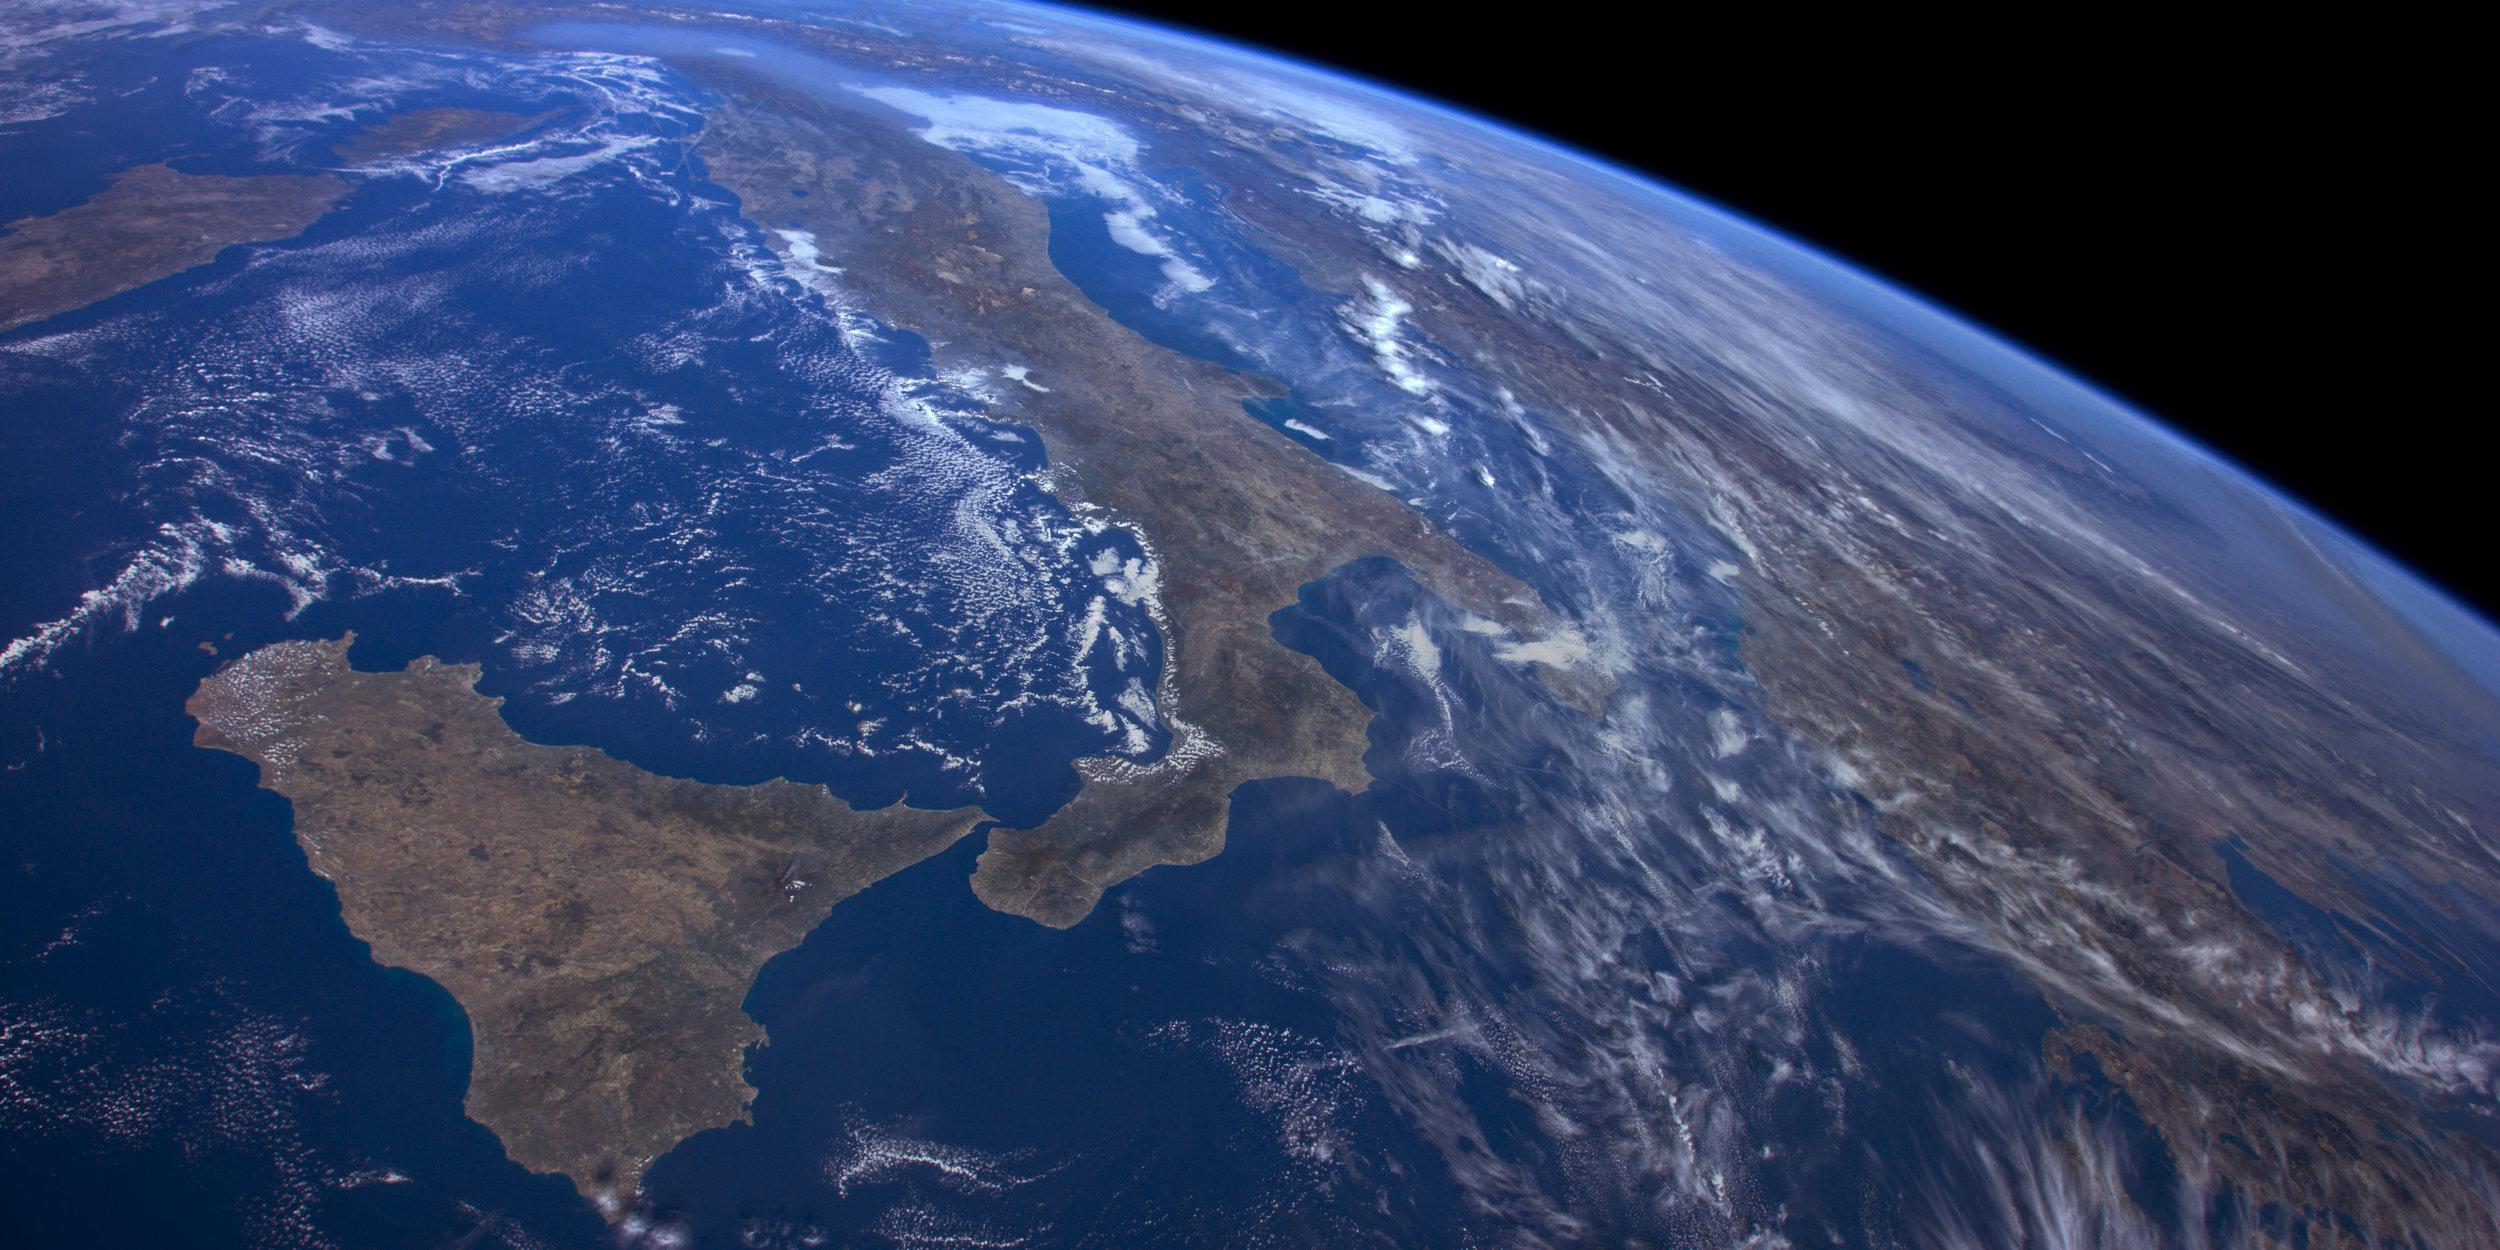 Image of Earth Aerial screensaver via Apple